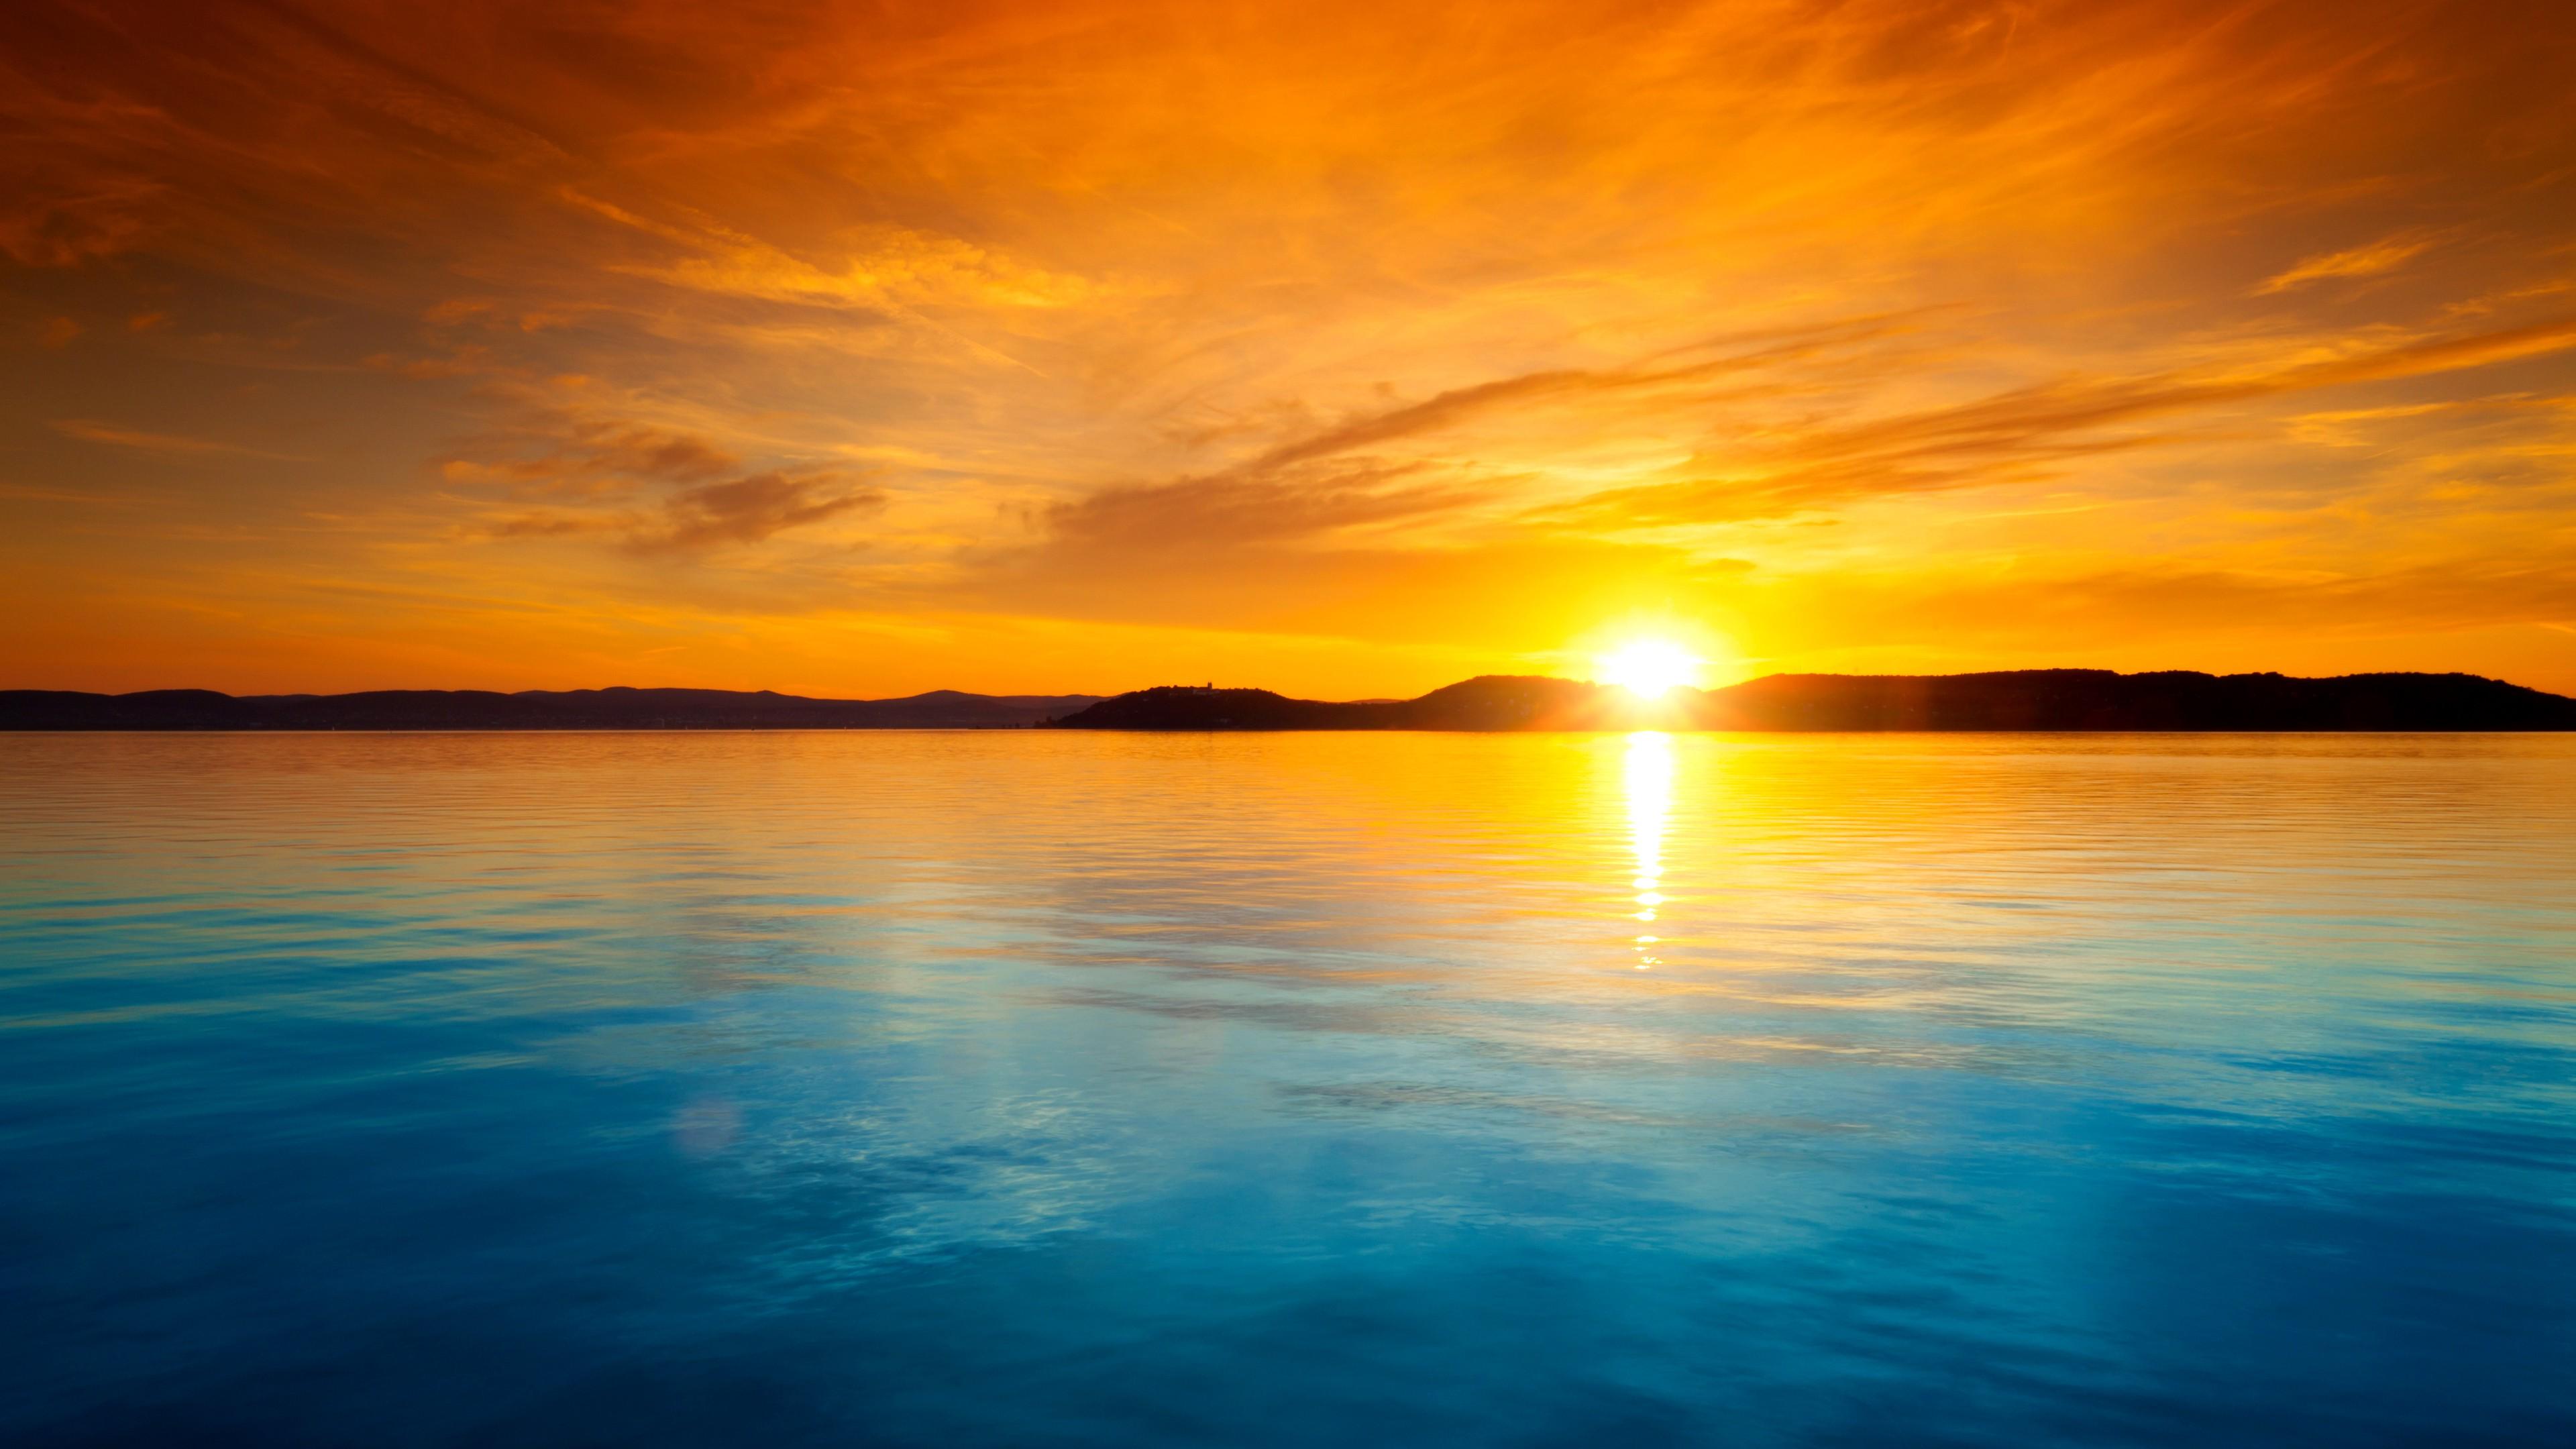 High Res Anime Wallpaper Sunset Landscape Horizon Wallpapers Hd Desktop And